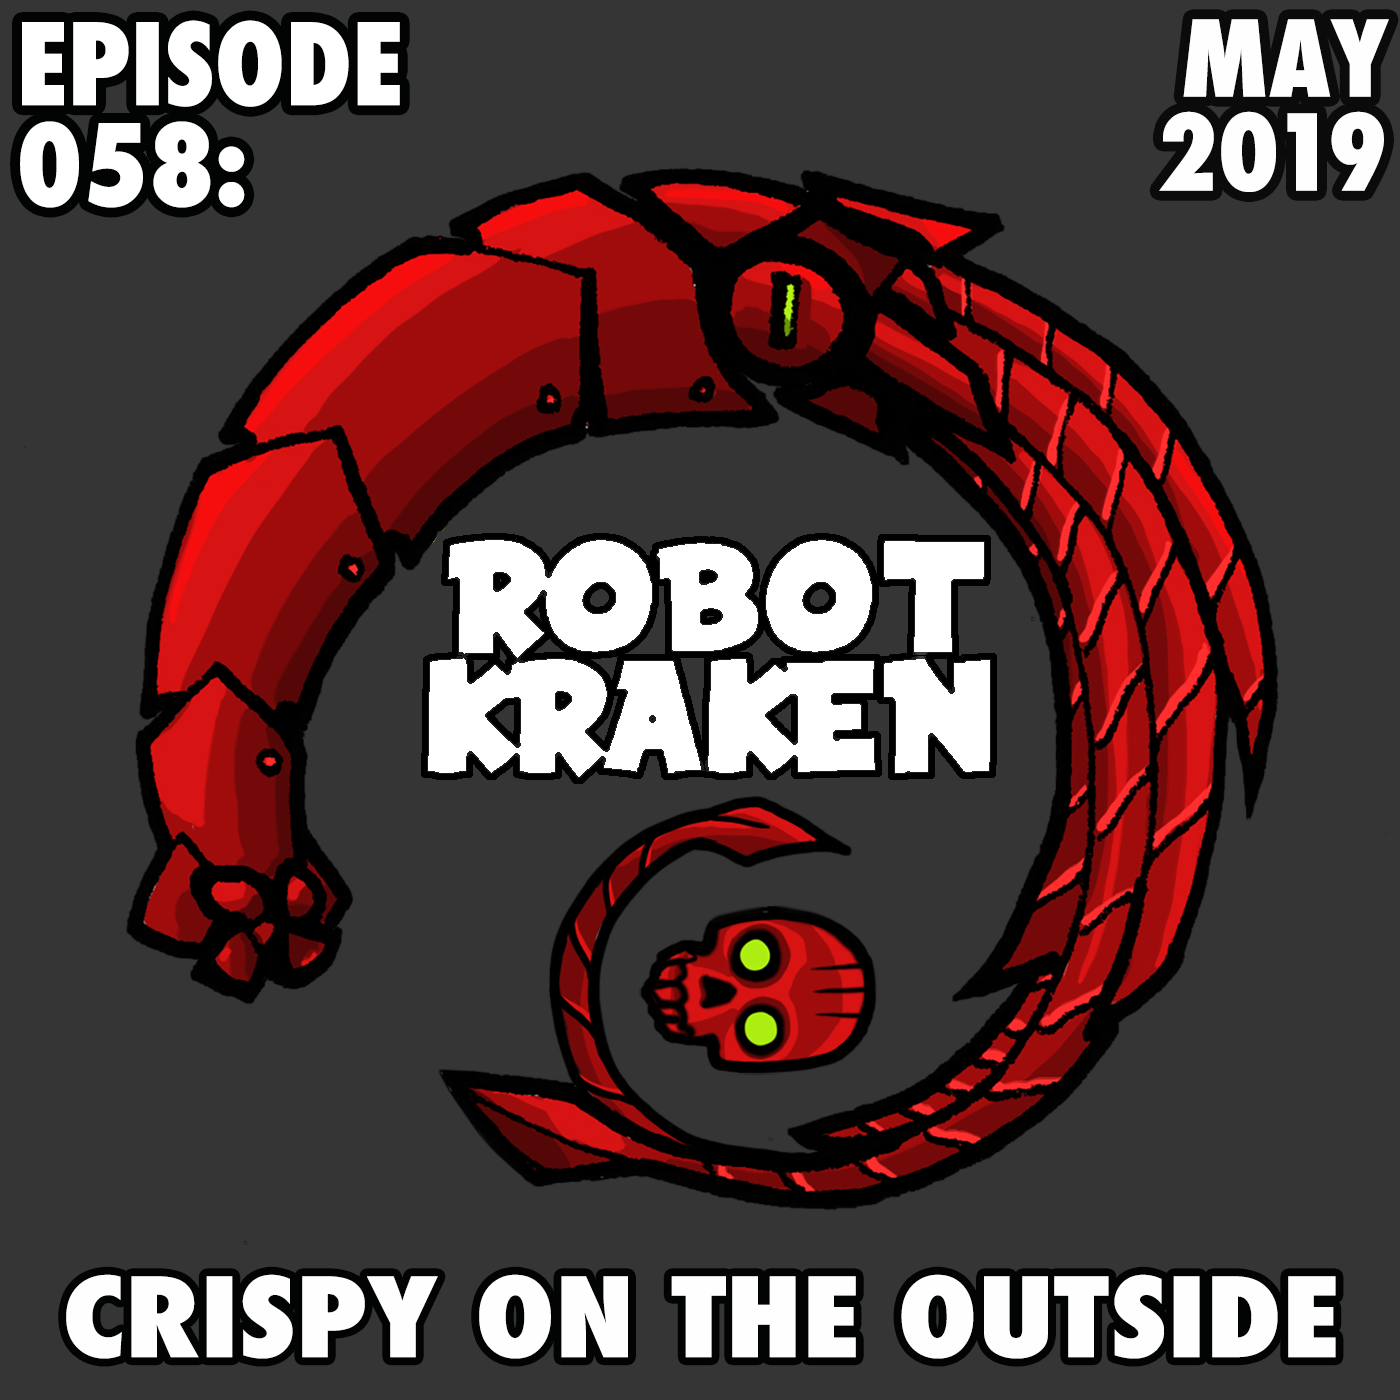 Robot-Kraken-058-Cover.png